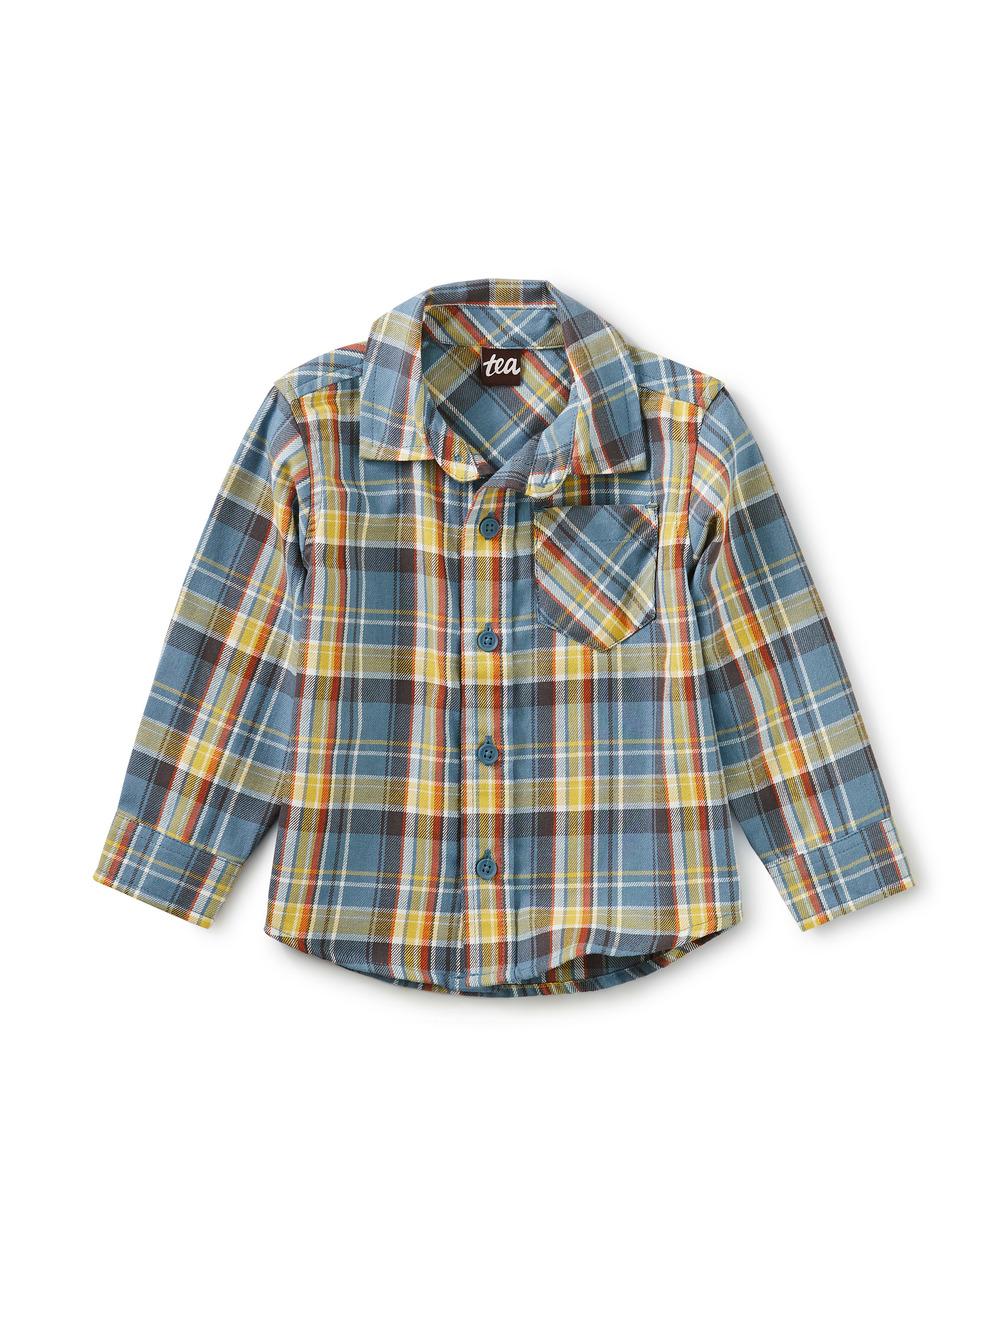 Plaid Baby Shirt